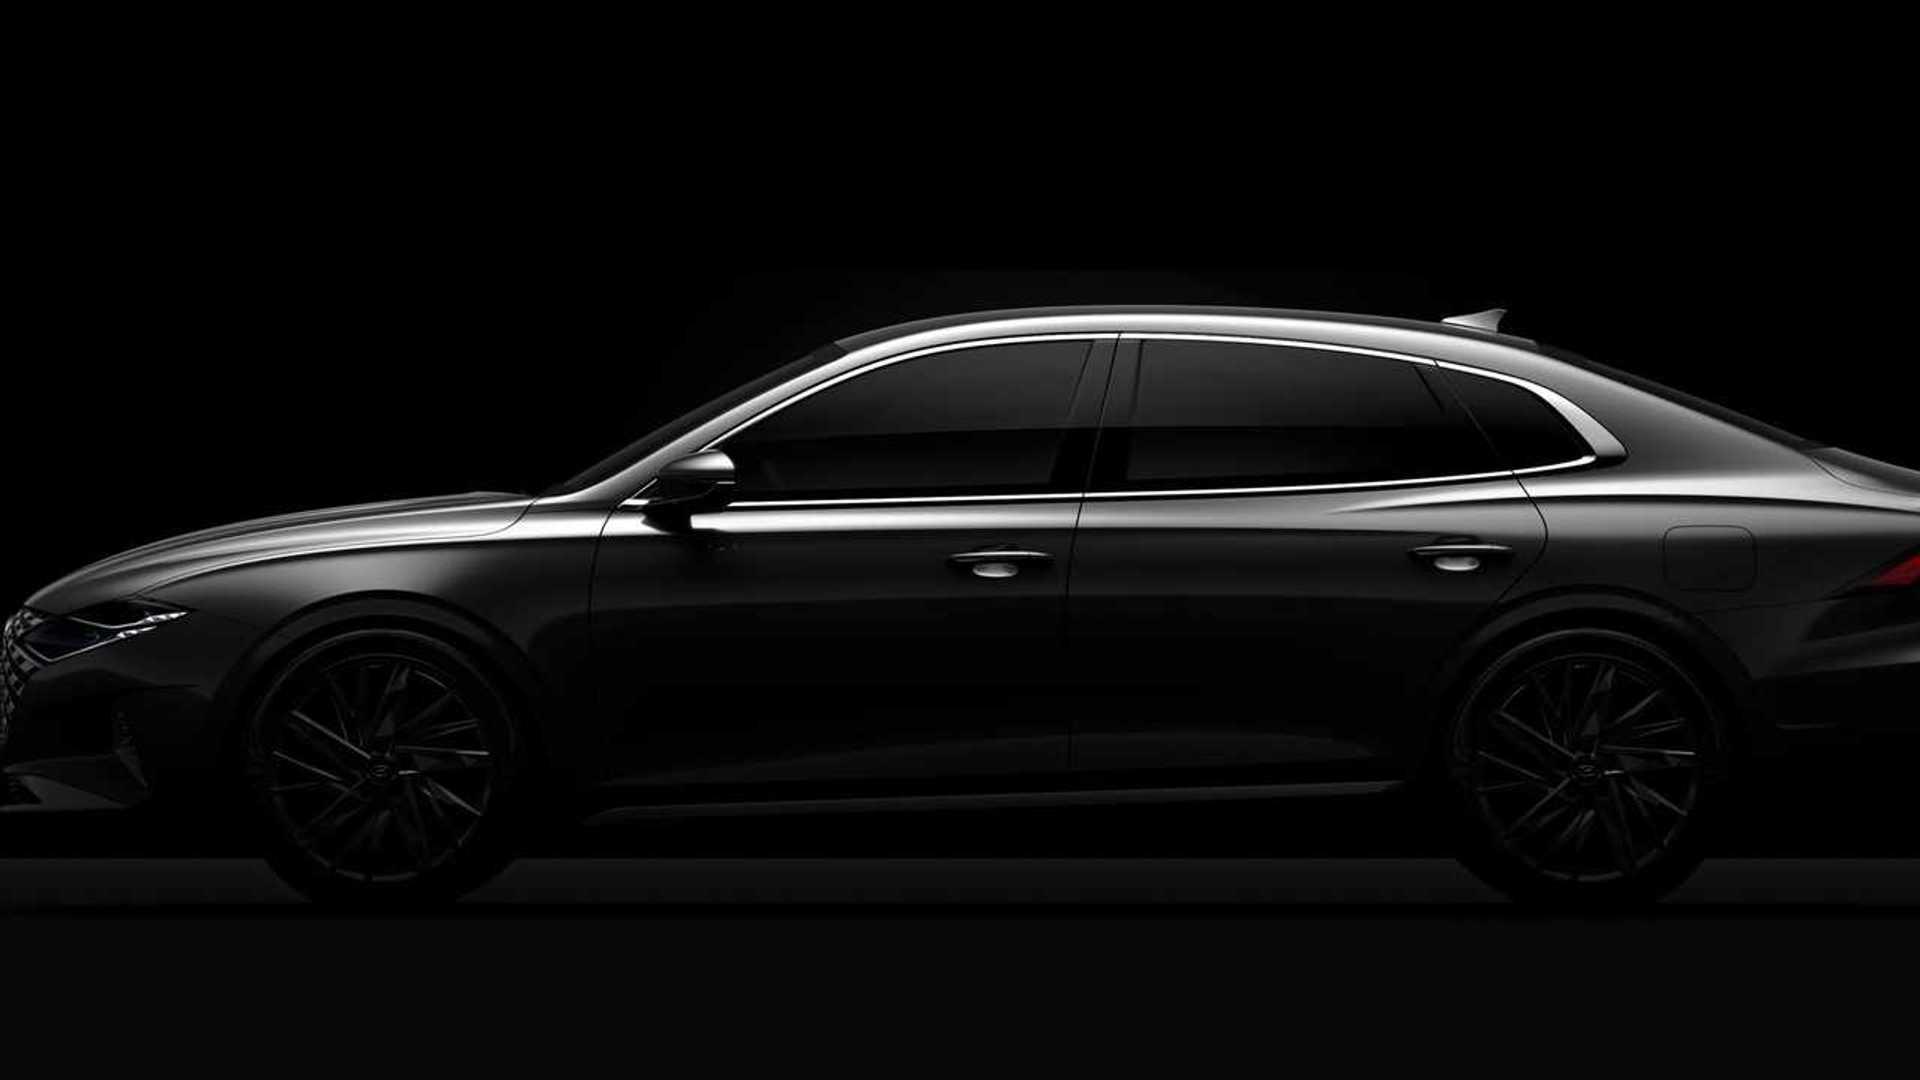 2020 Hyundai Grandeur / Azera Reveals Its Grand Facelift